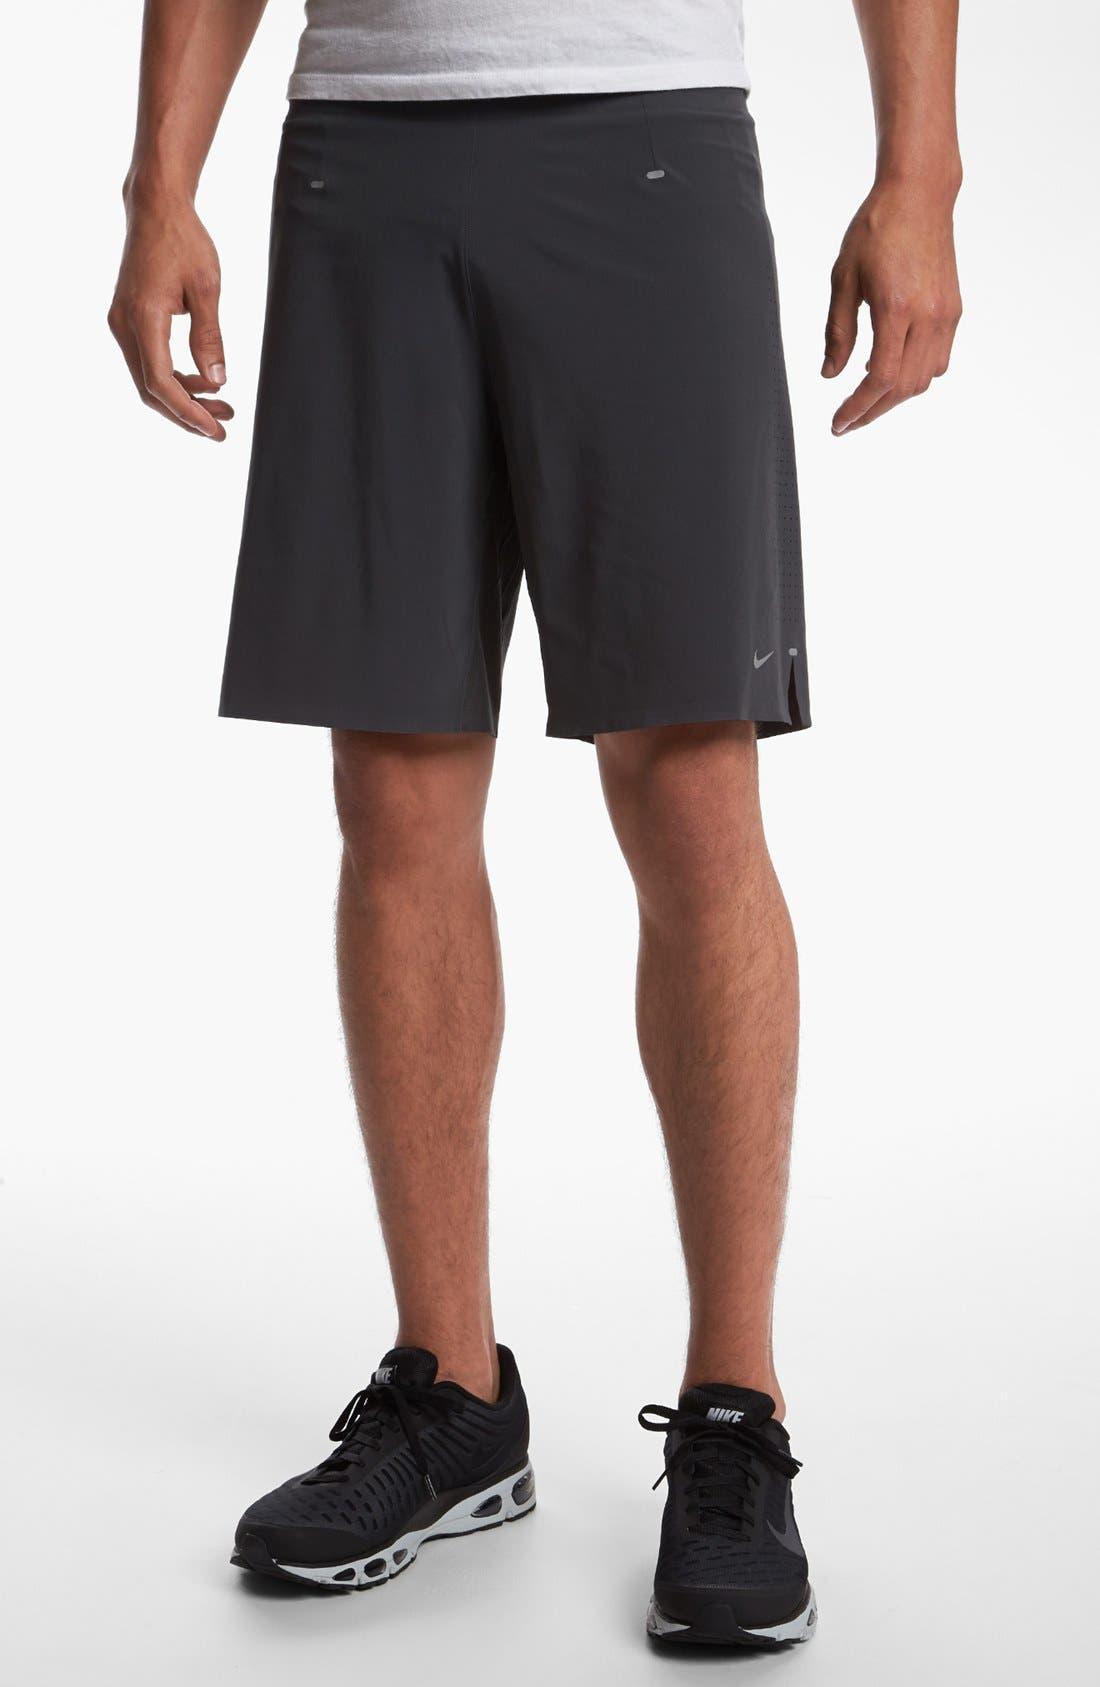 Alternate Image 1 Selected - Nike 'Instinct' Stretch Woven Running Shorts